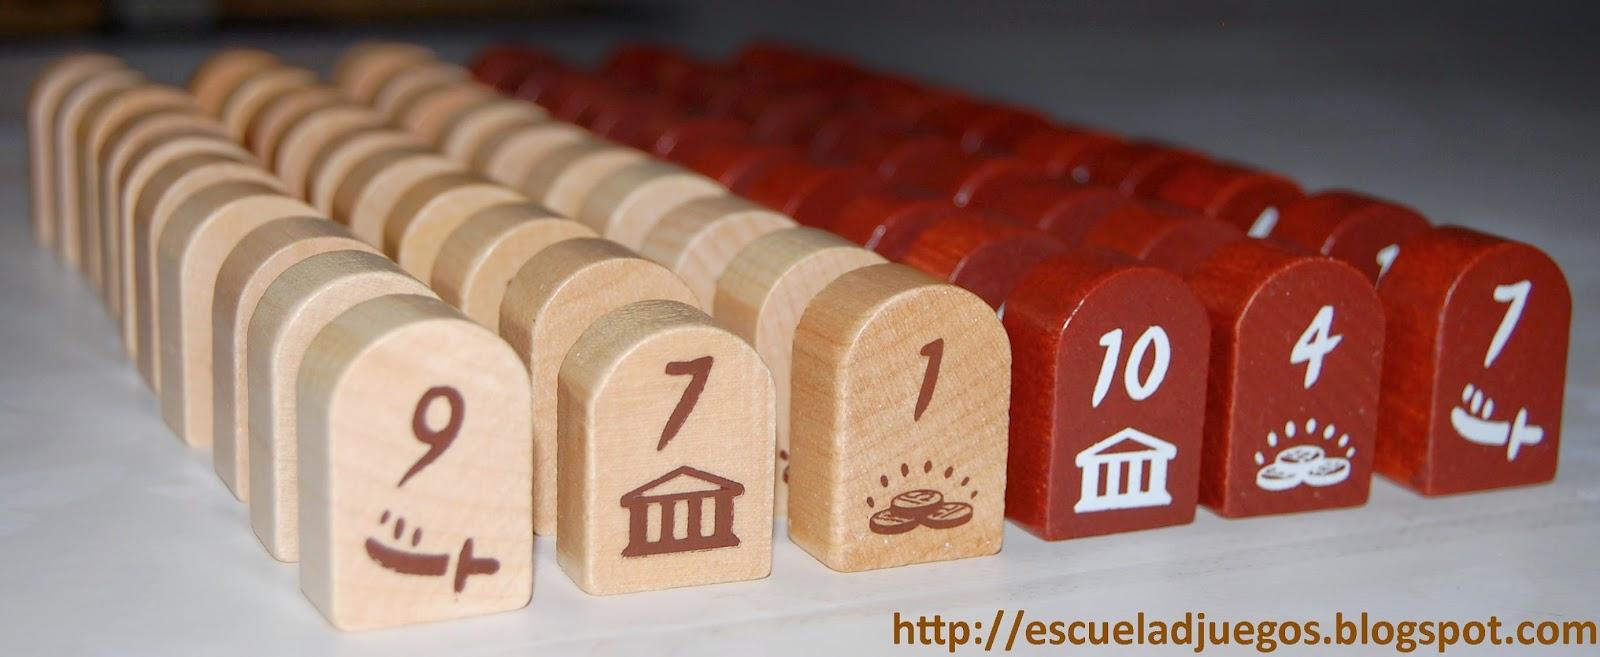 Bloques de madera representando a los votantes